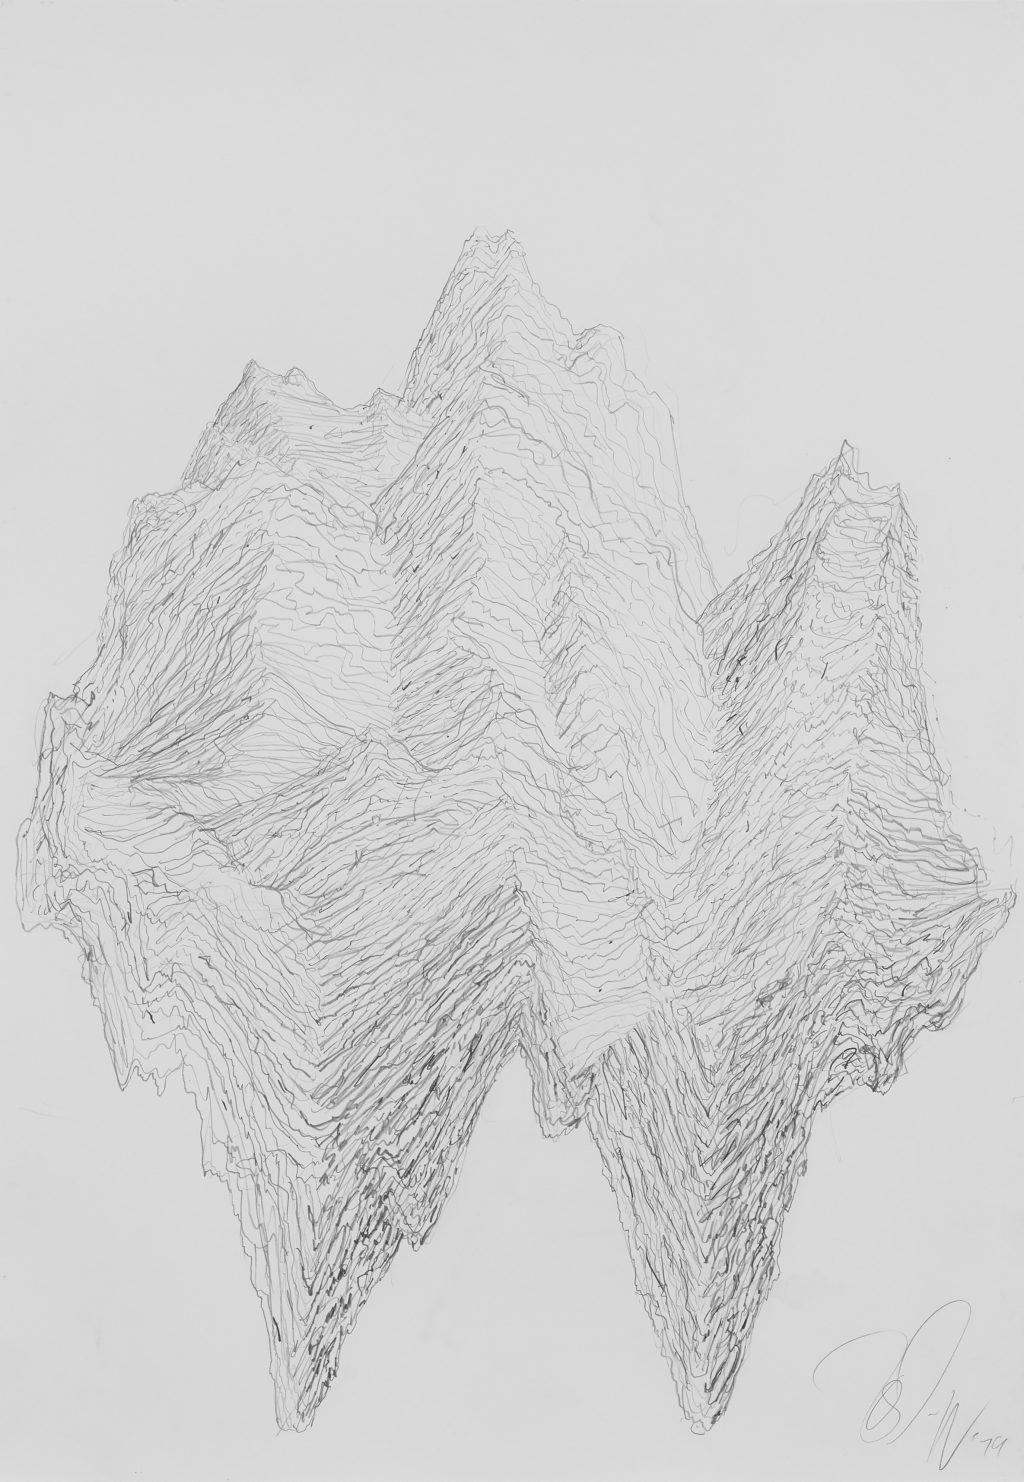 Tony Cragg – Drawing as Continuum